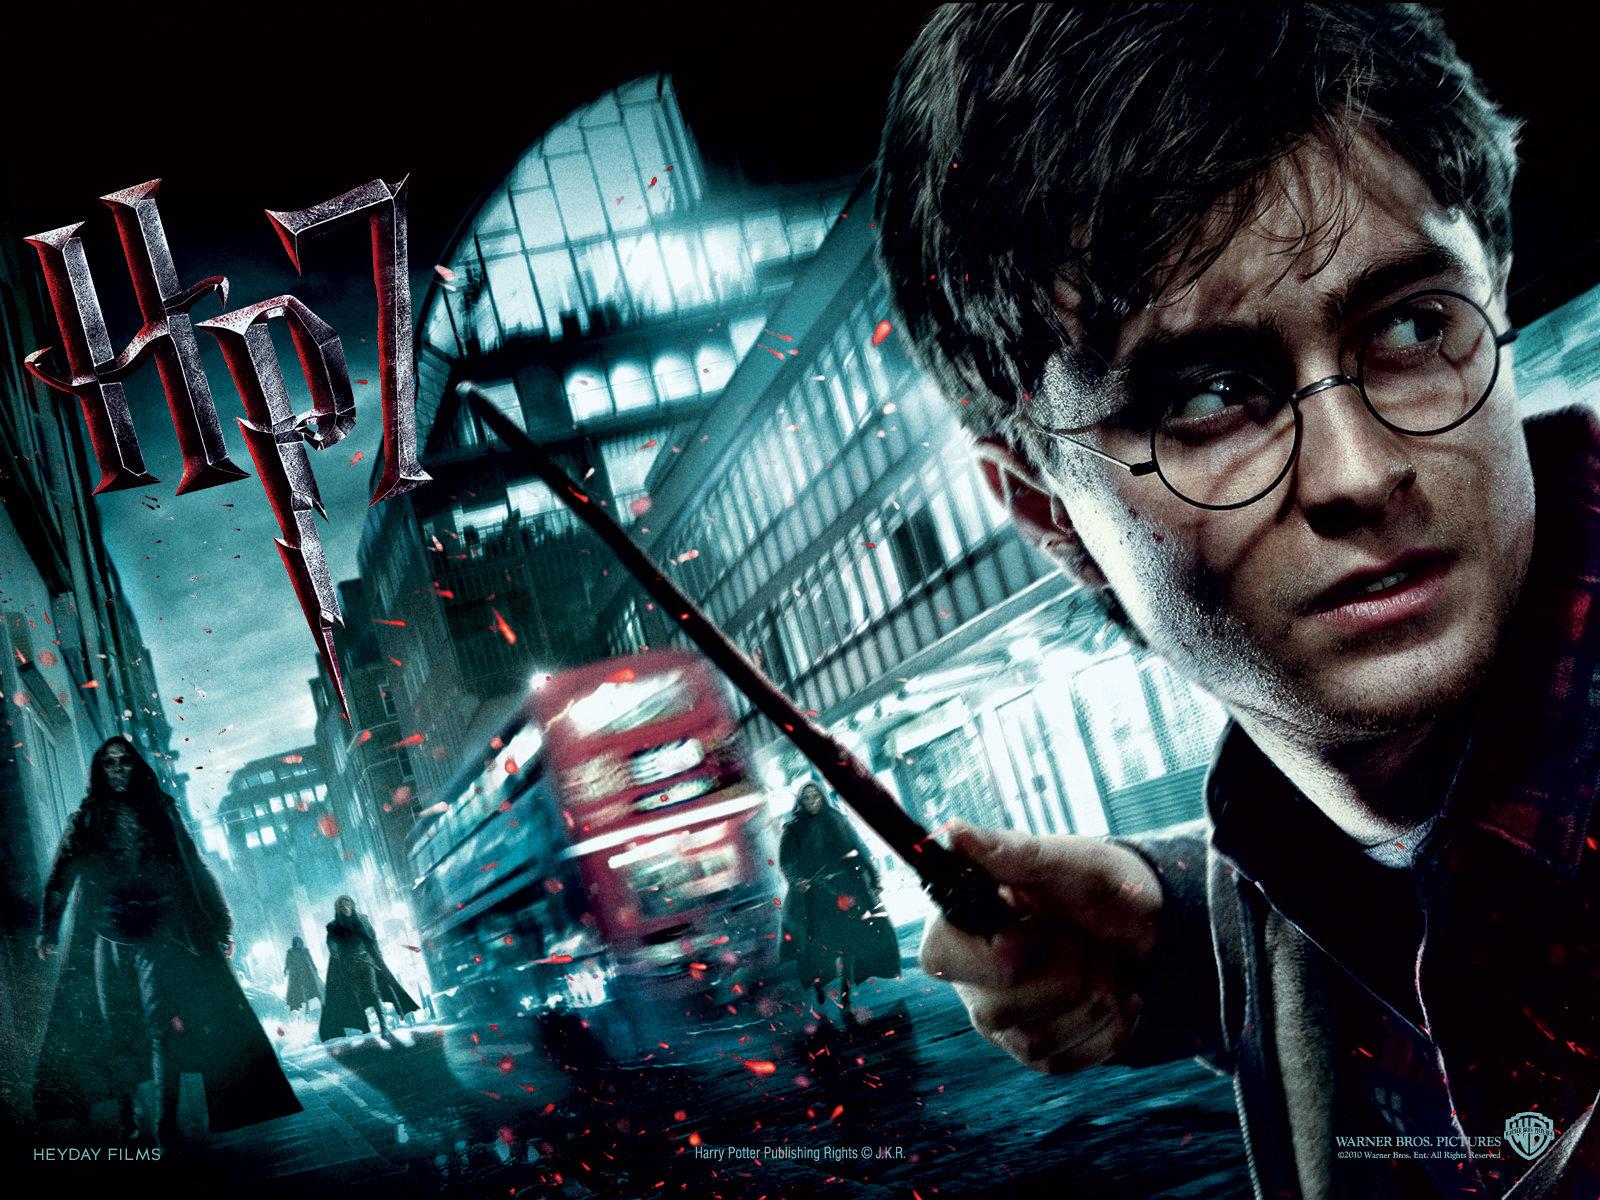 Fond d'écran hd Harry Potter 7